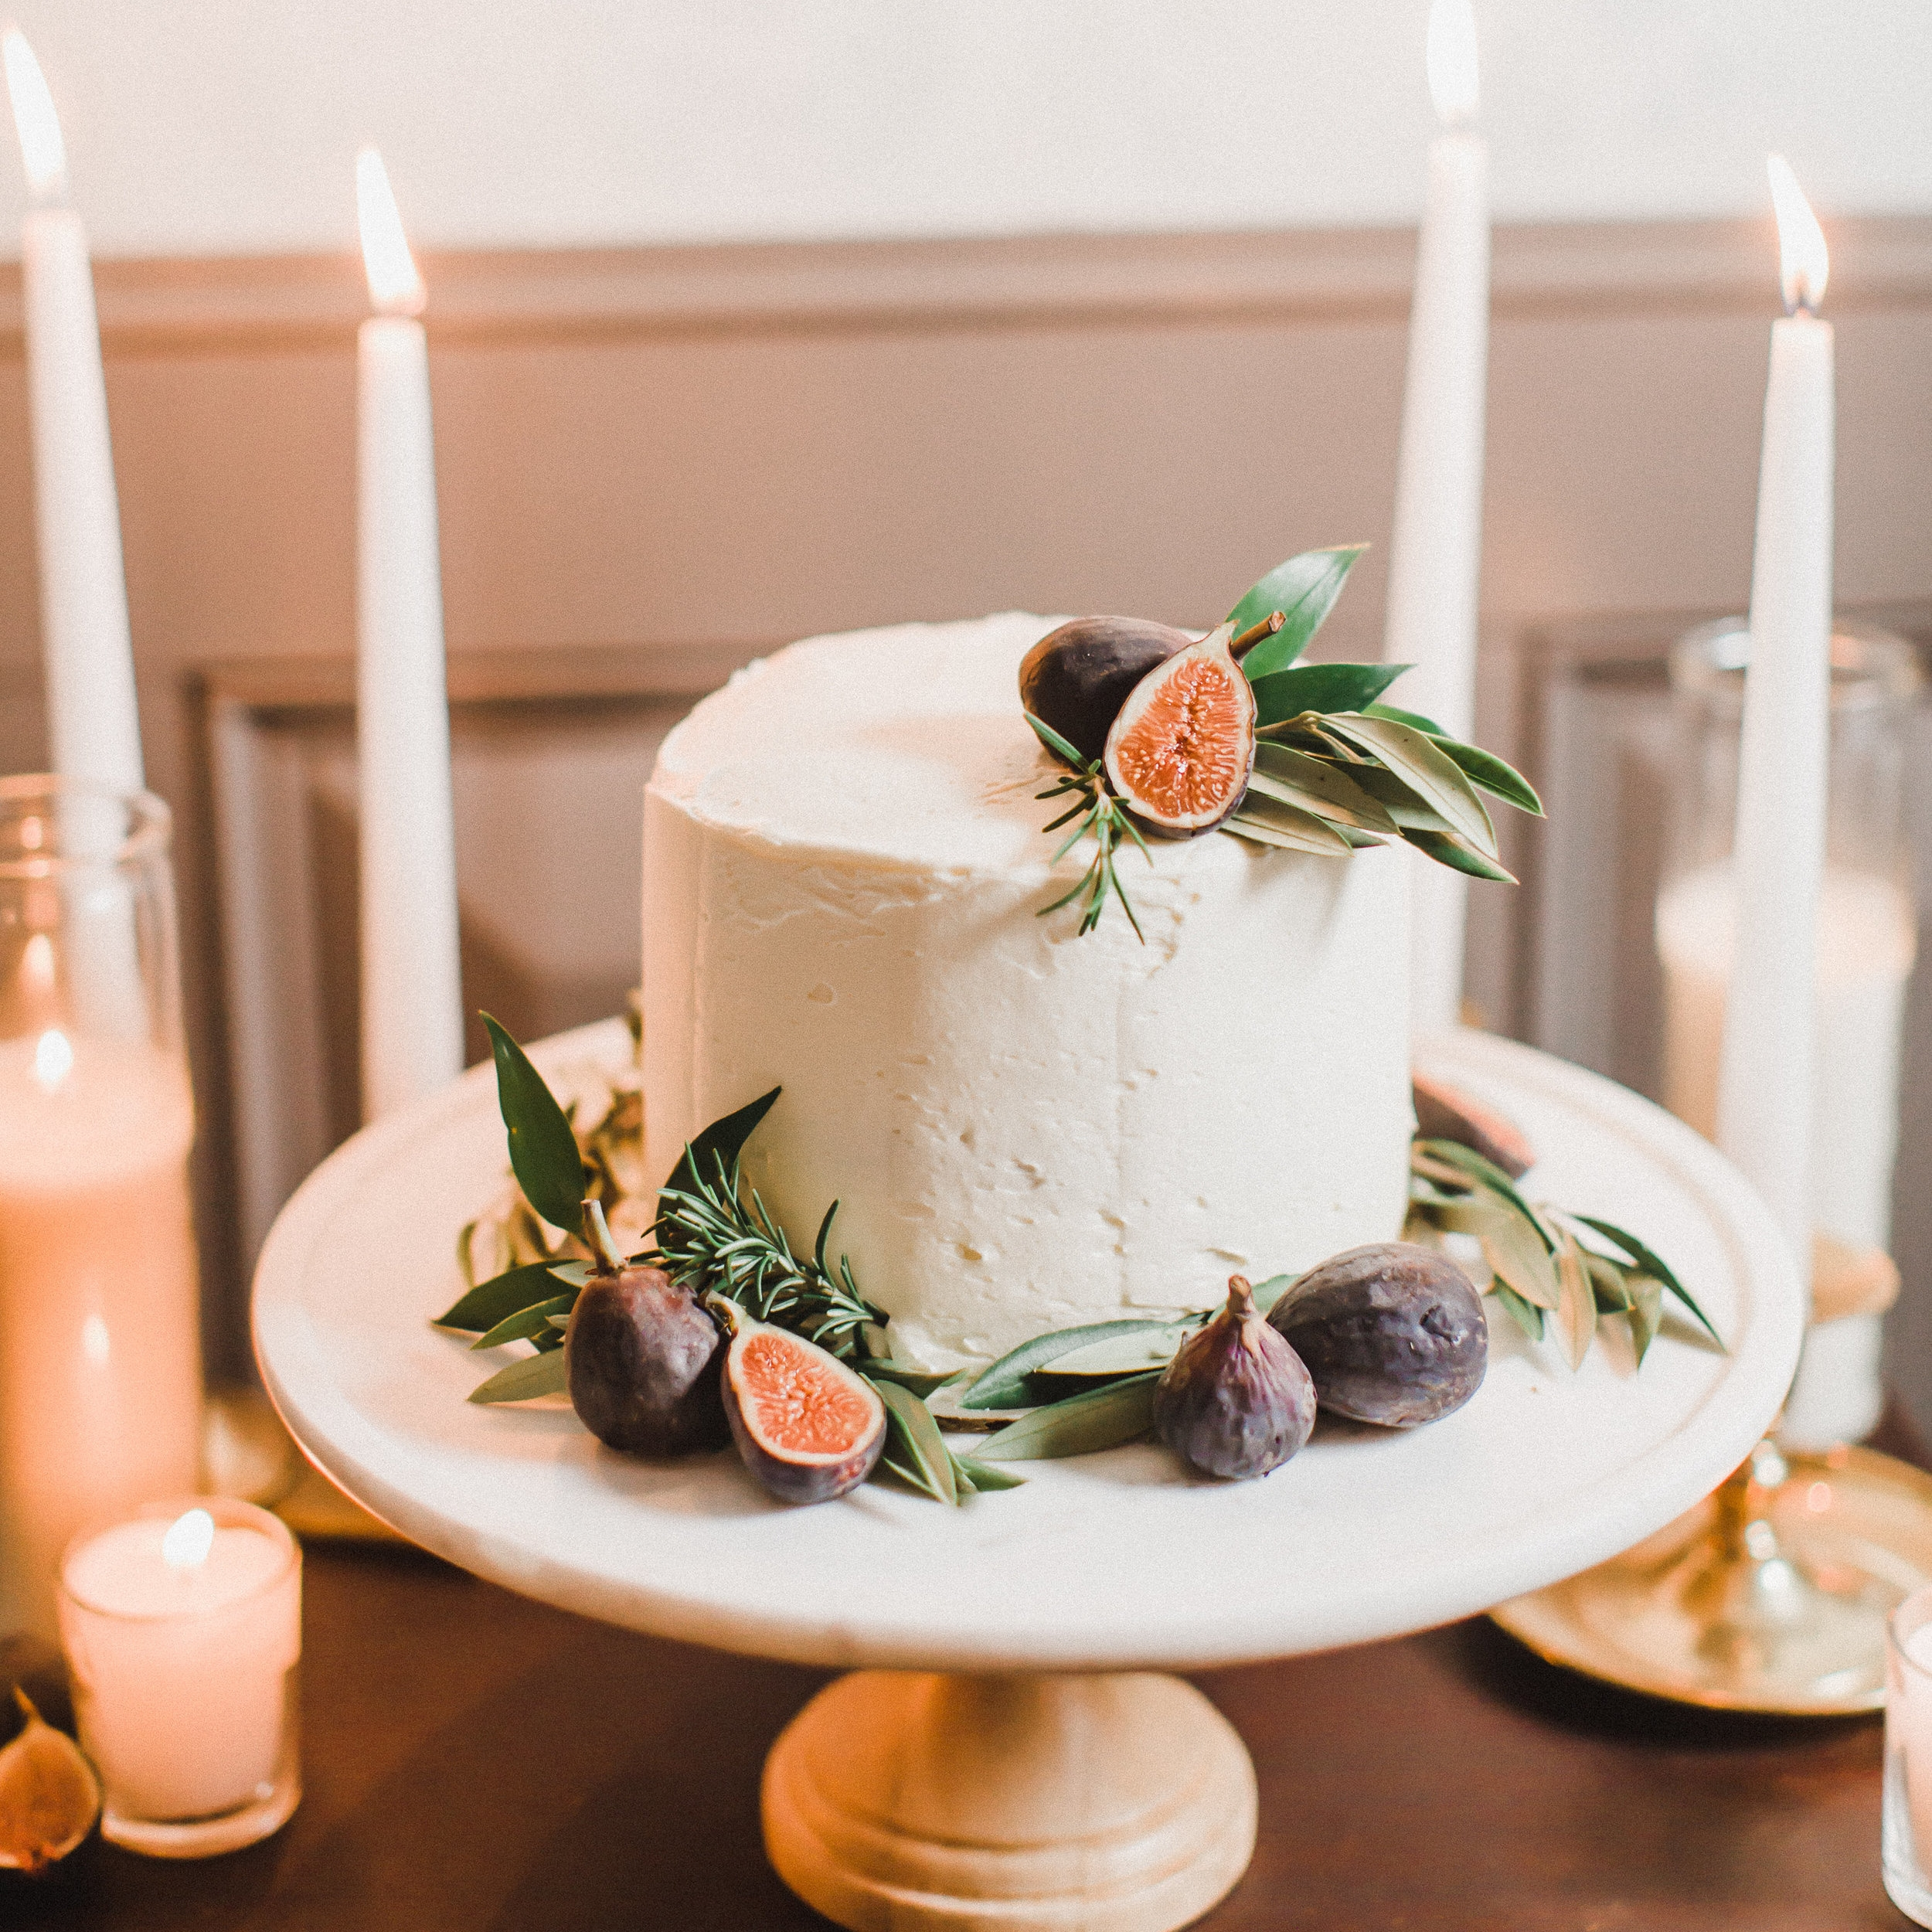 WPA Bakery - $Richmond, VAPHOTO | Annamarie Akins